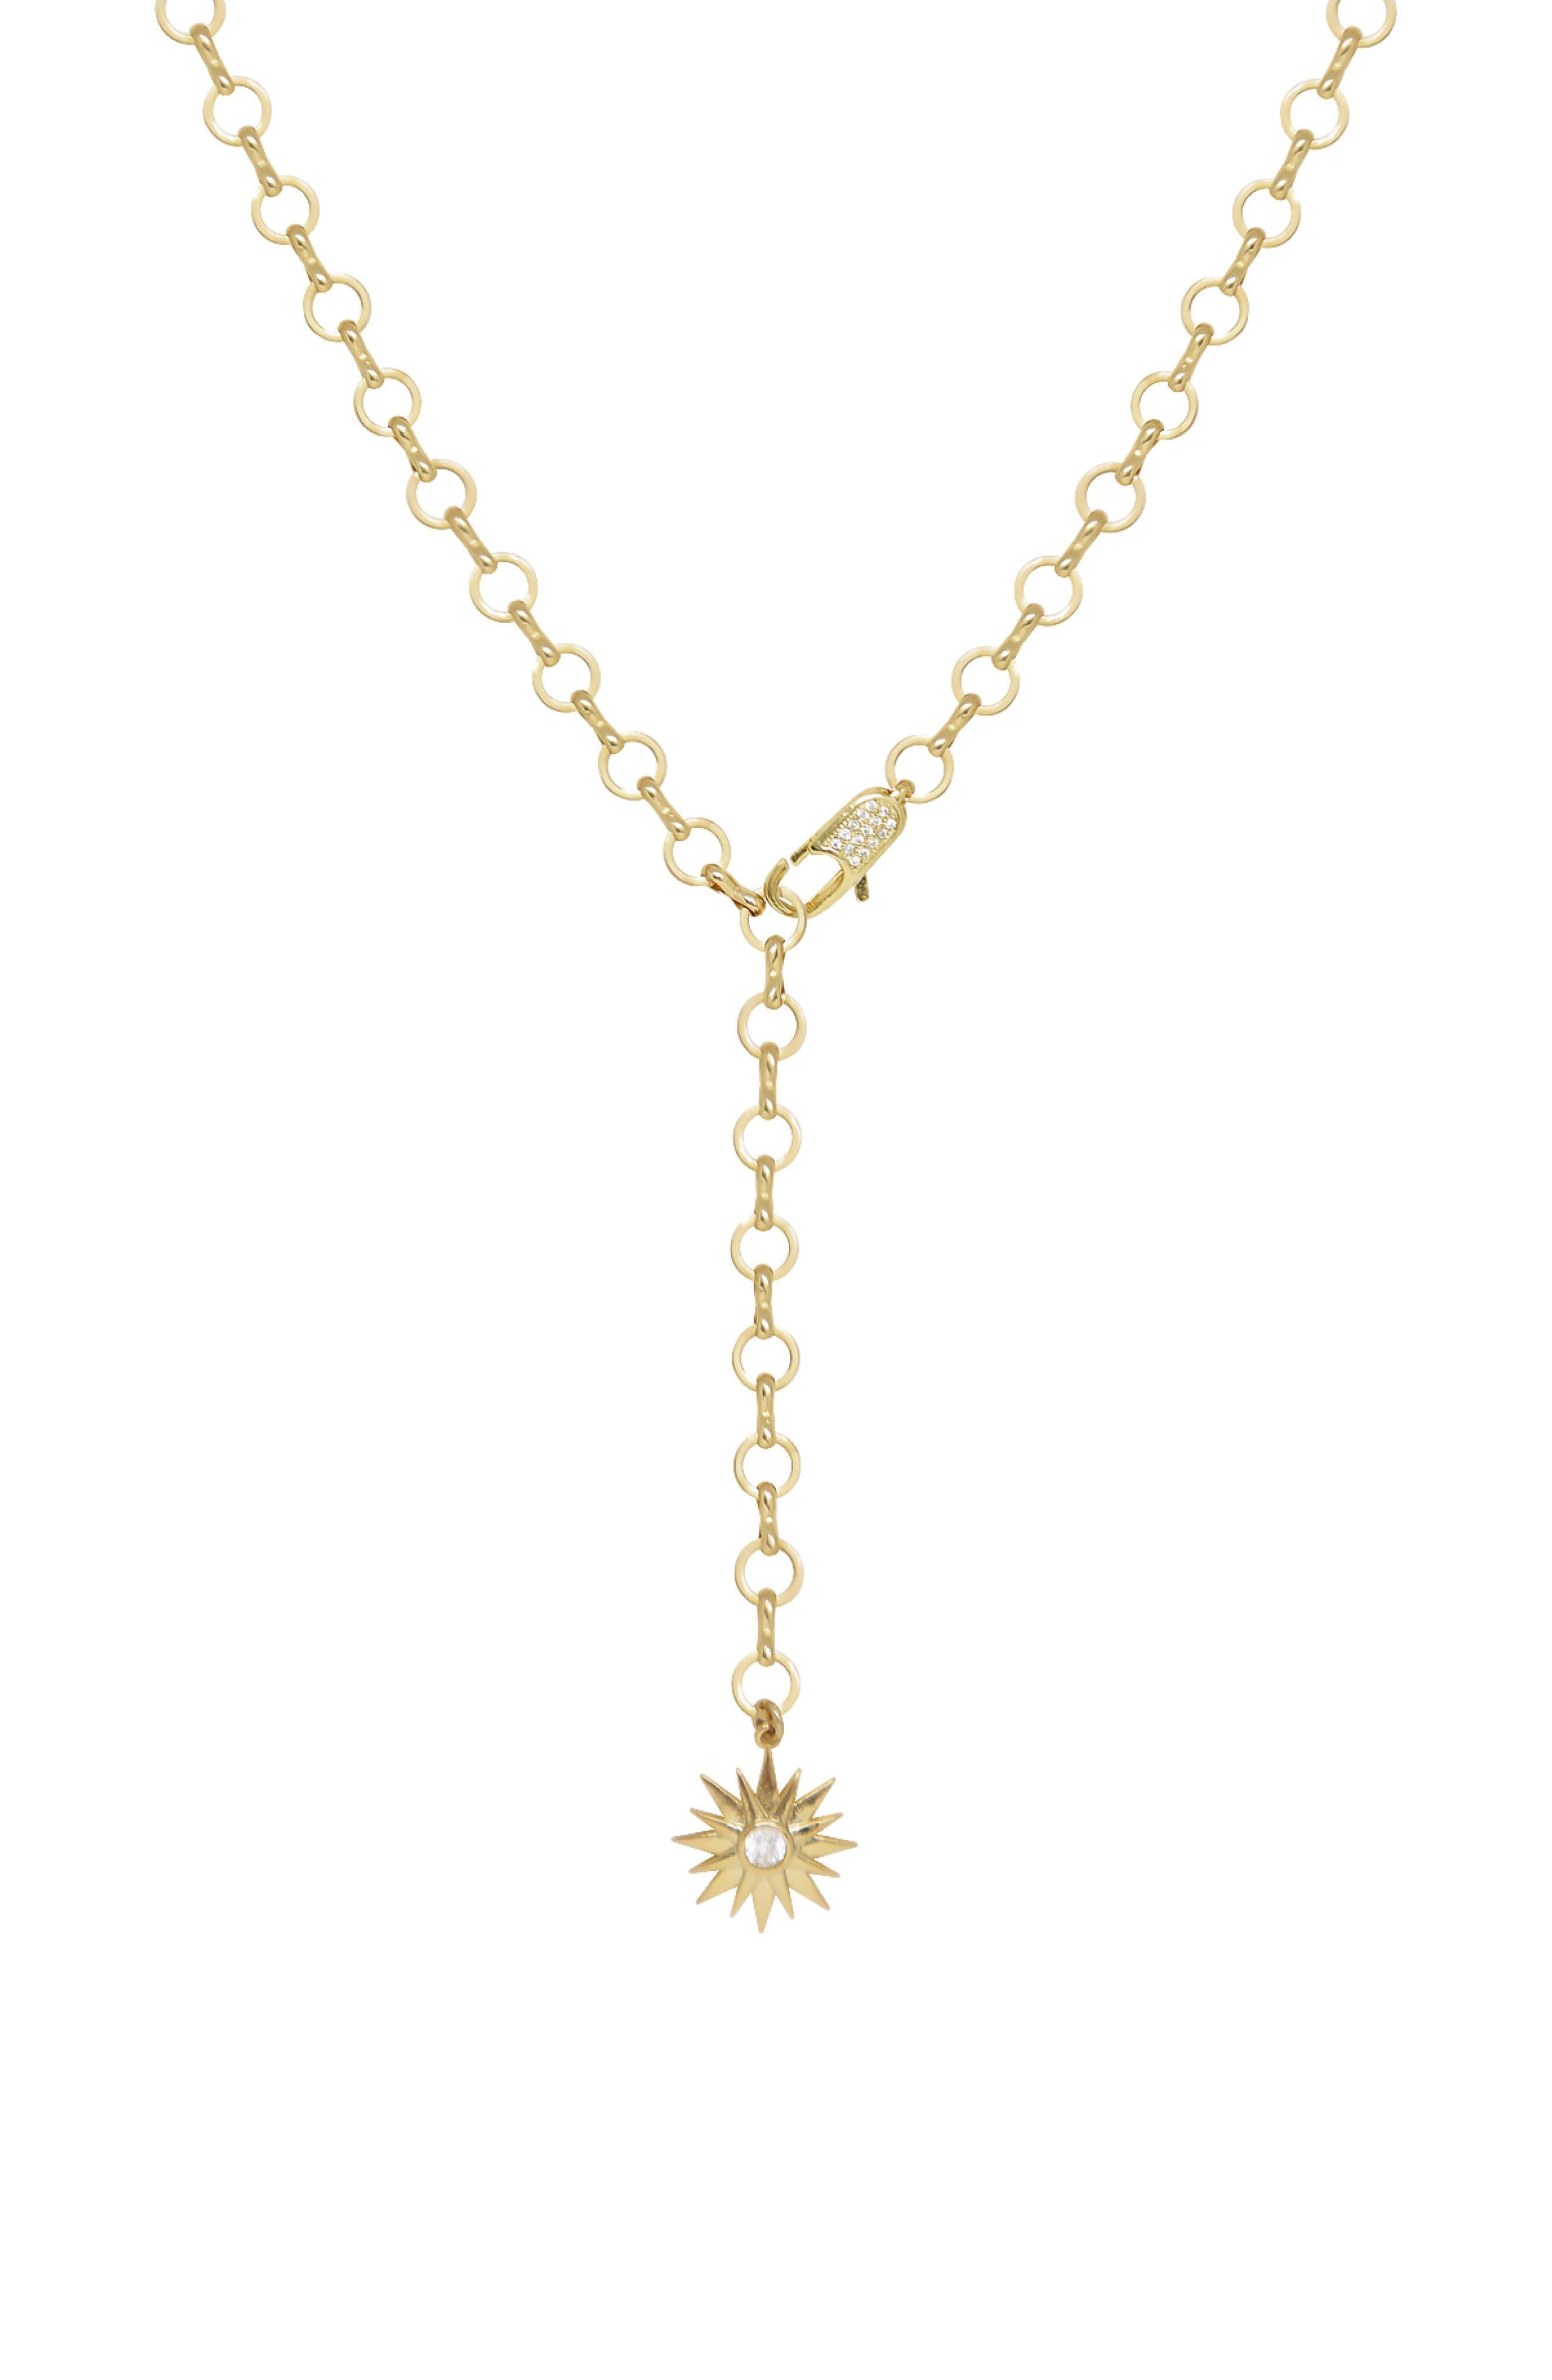 Starburst Lariat Necklace